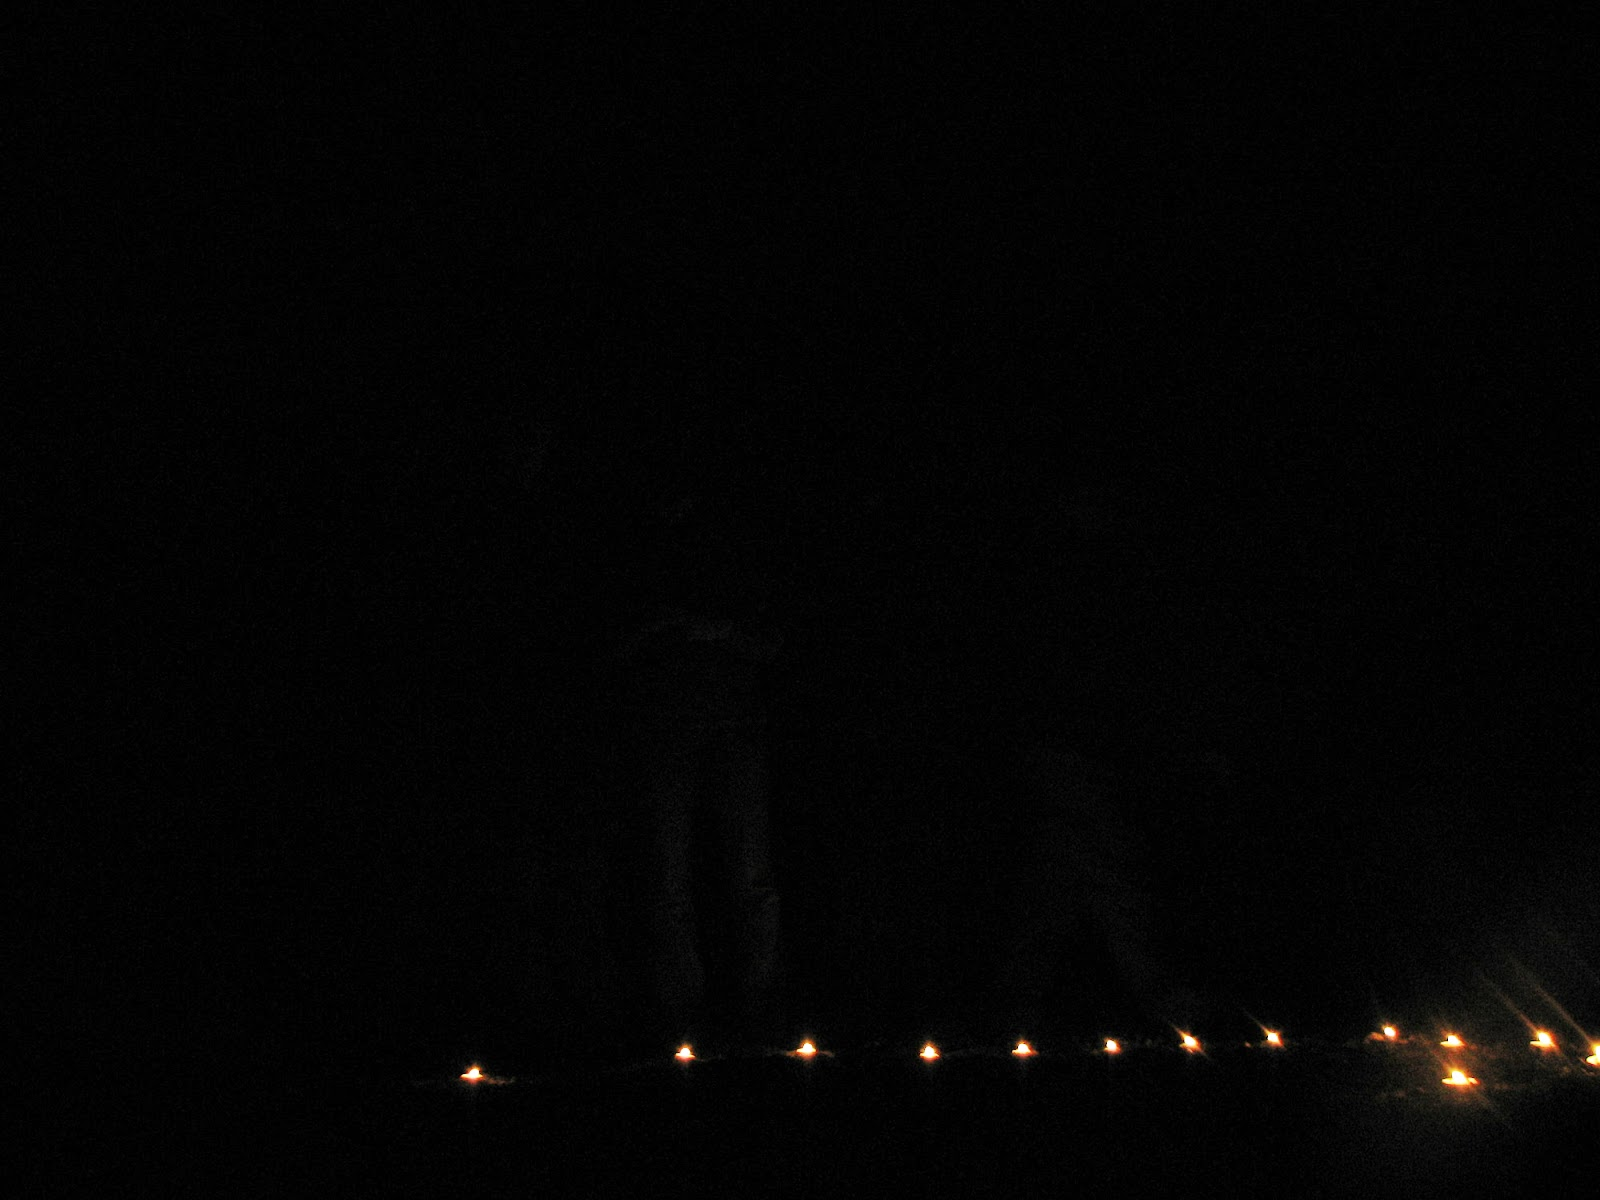 Prehod PP, Ilirska Bistrica 2005 - picture%2B070.jpg